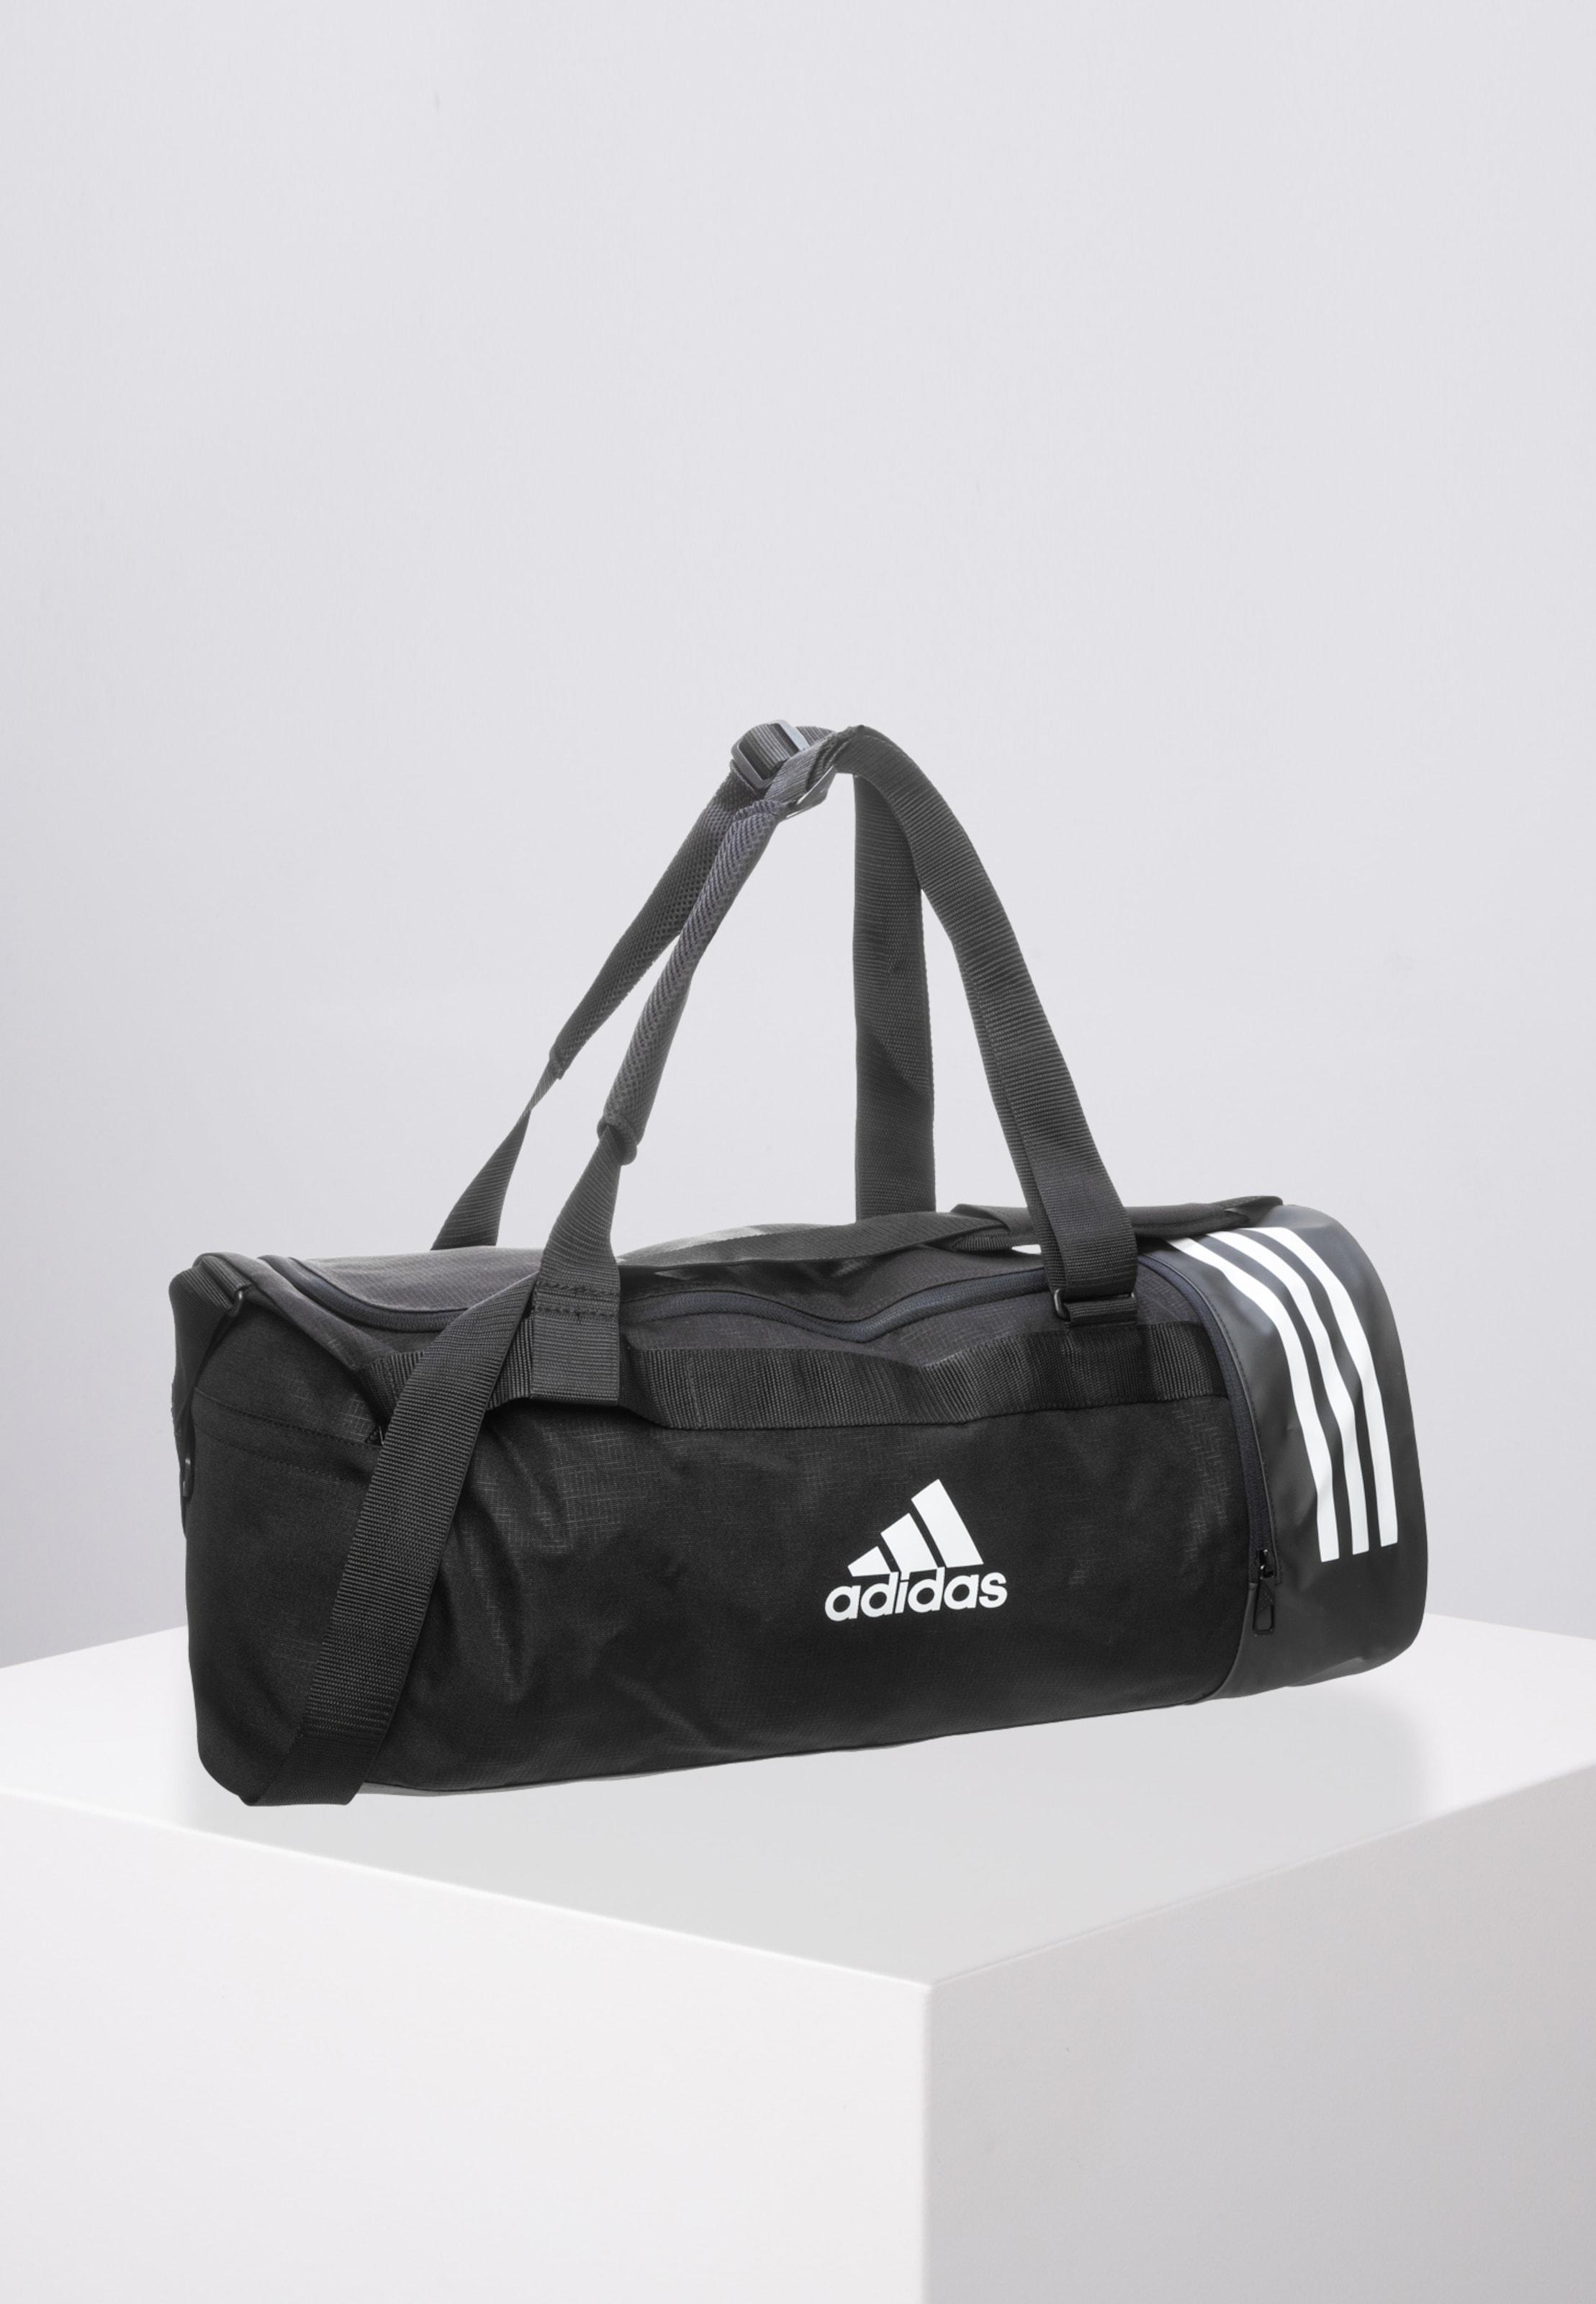 Adidas Performance M Sporttasche Herren Convertible stripes In 3 Schwarz 5RA34jqLcS